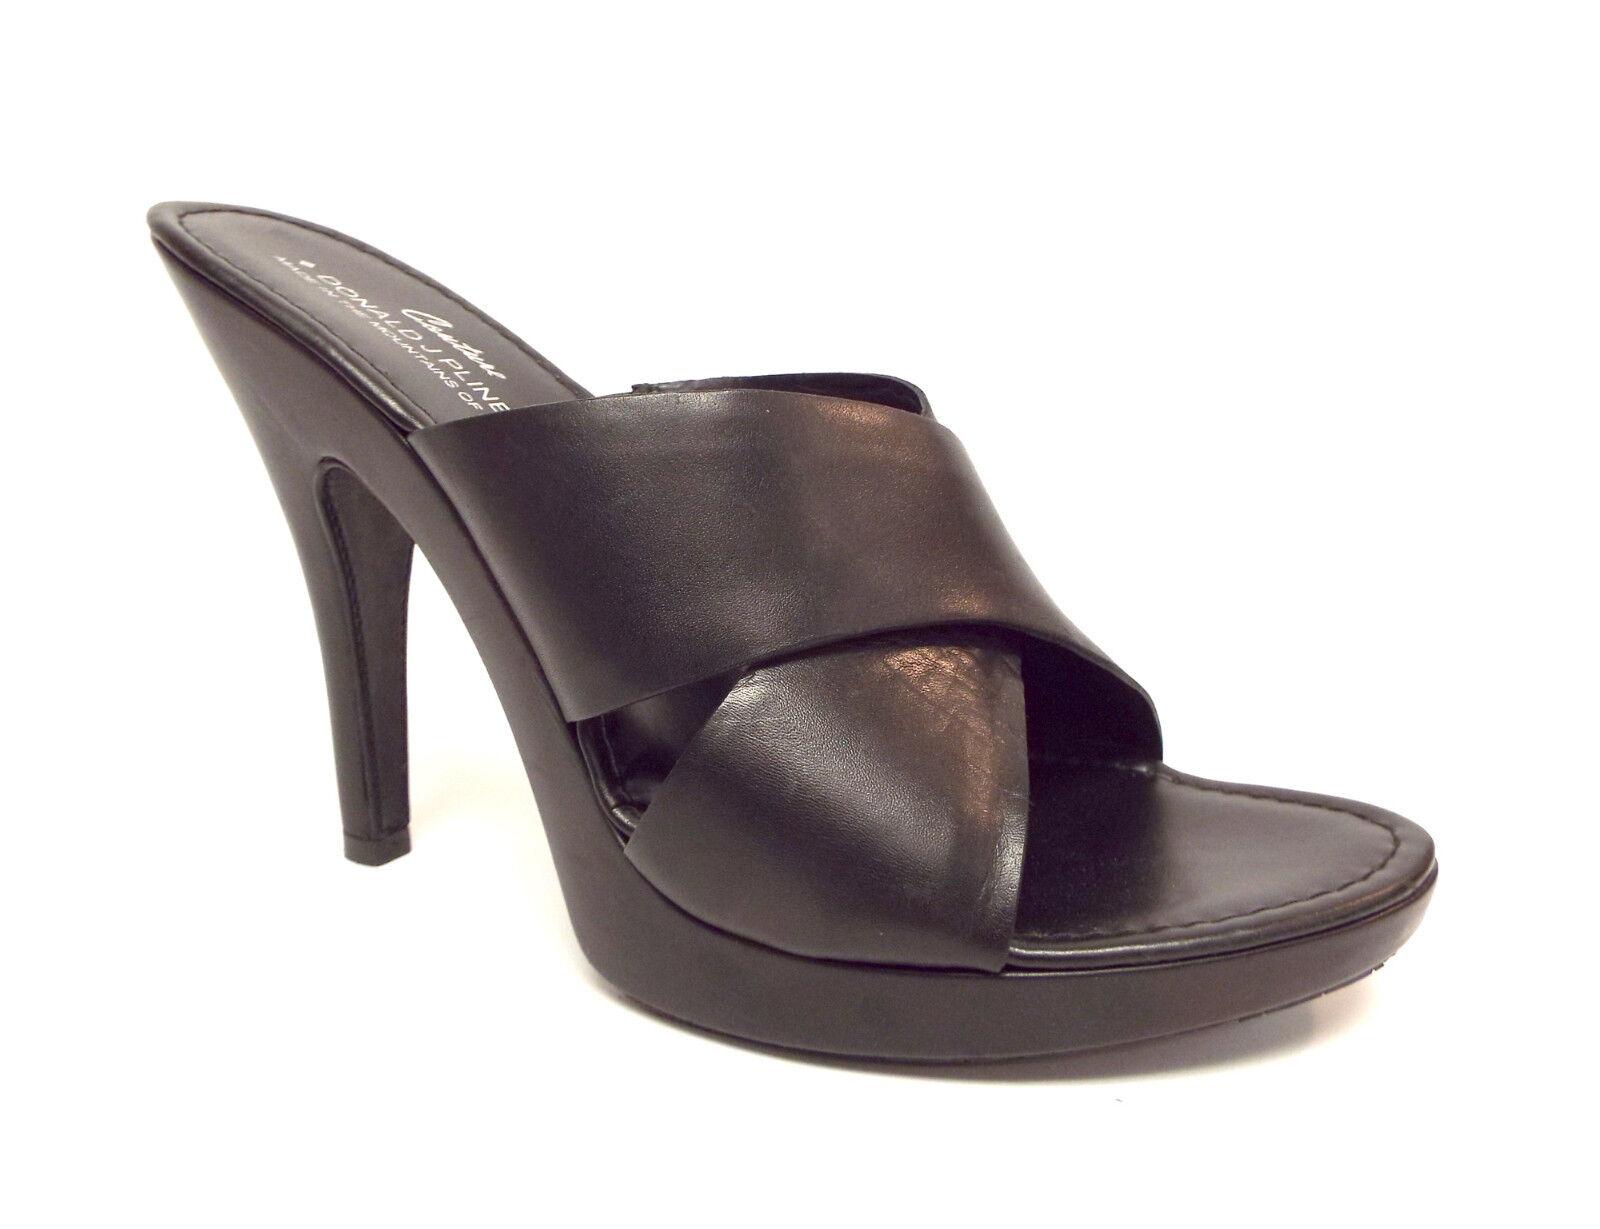 DONALD PLINER Size 8.5 GYPSY Black Leather Cross Strap Slide Sandals shoes 8 1 2